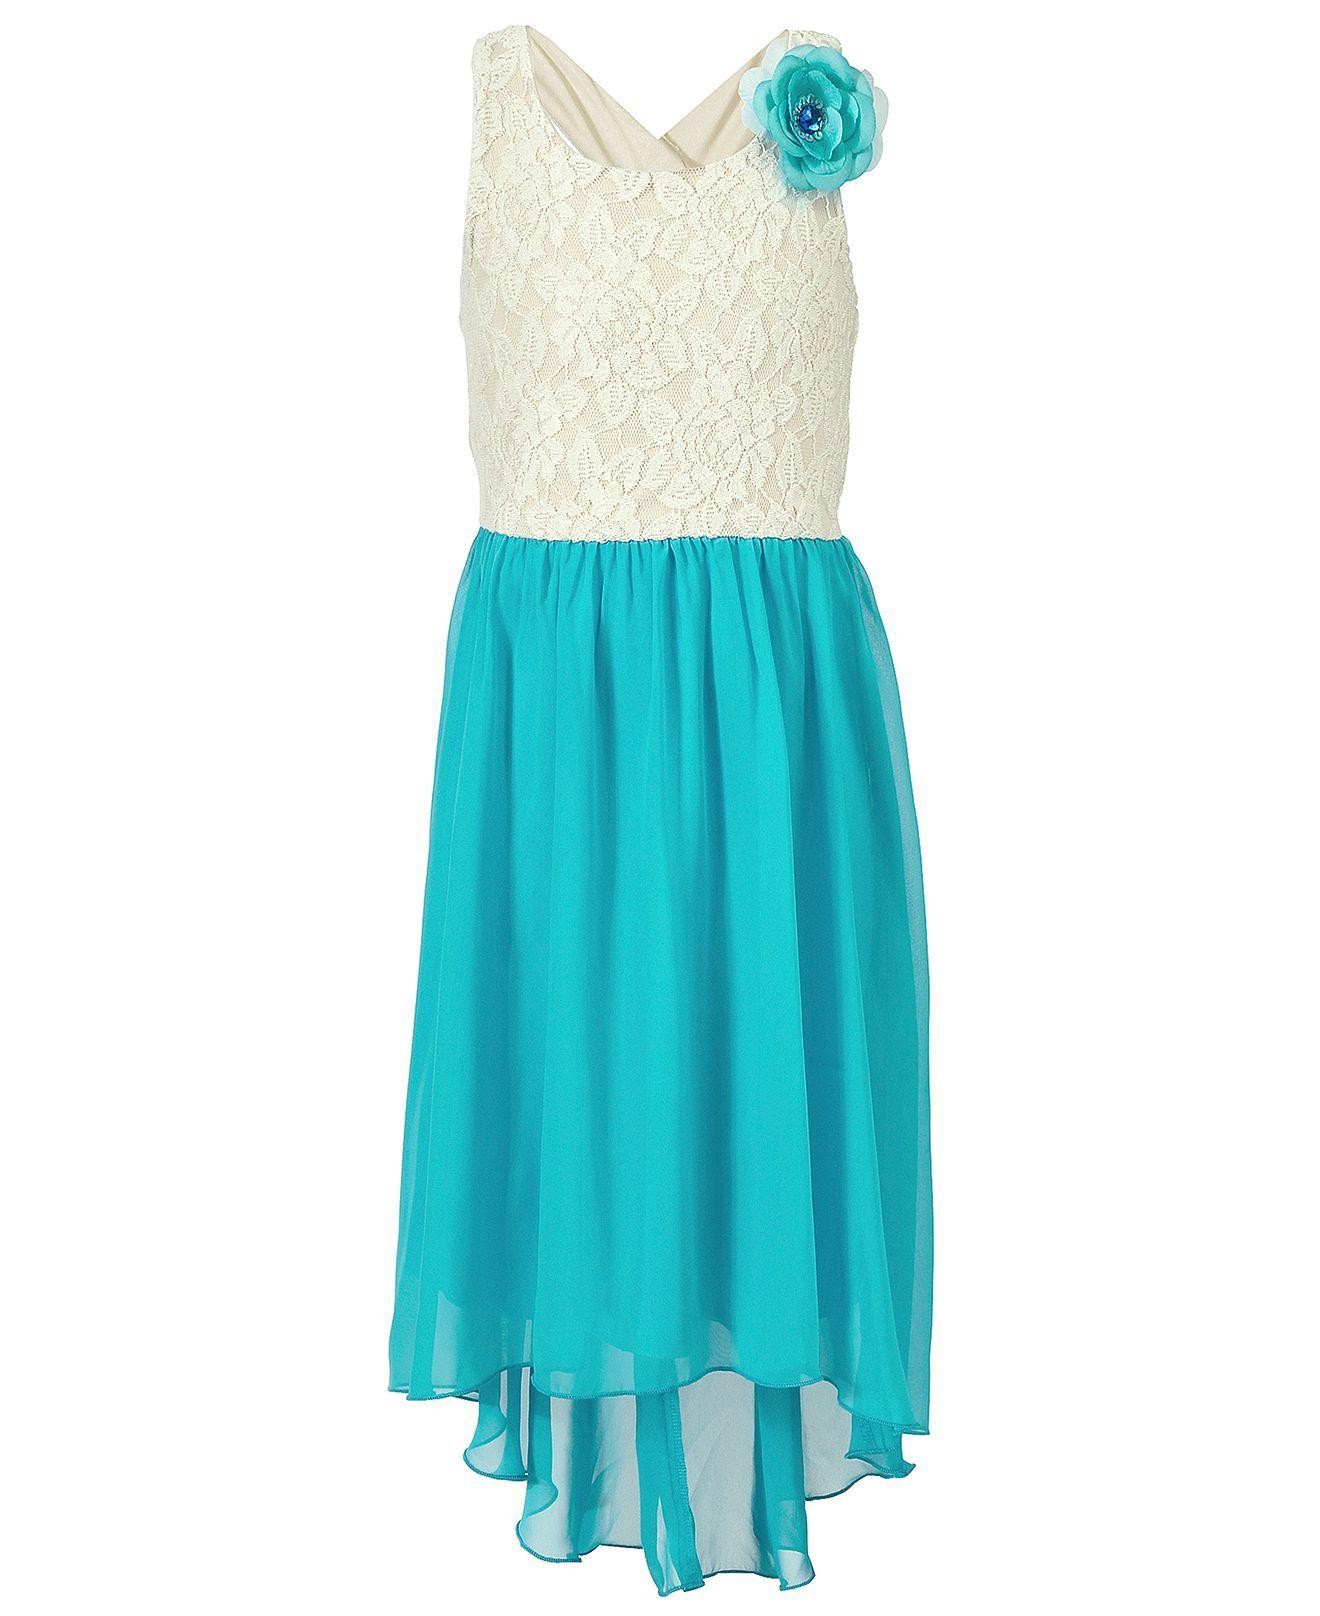 9d73455aa Speechless Girls Dress, Girls Lace-to-Chiffon High-Low Dress - Kids Girls  Dresses - Macy's @Allison j.d.m j.d.m Lafaille Natalie NEEDS this for my  wedding.